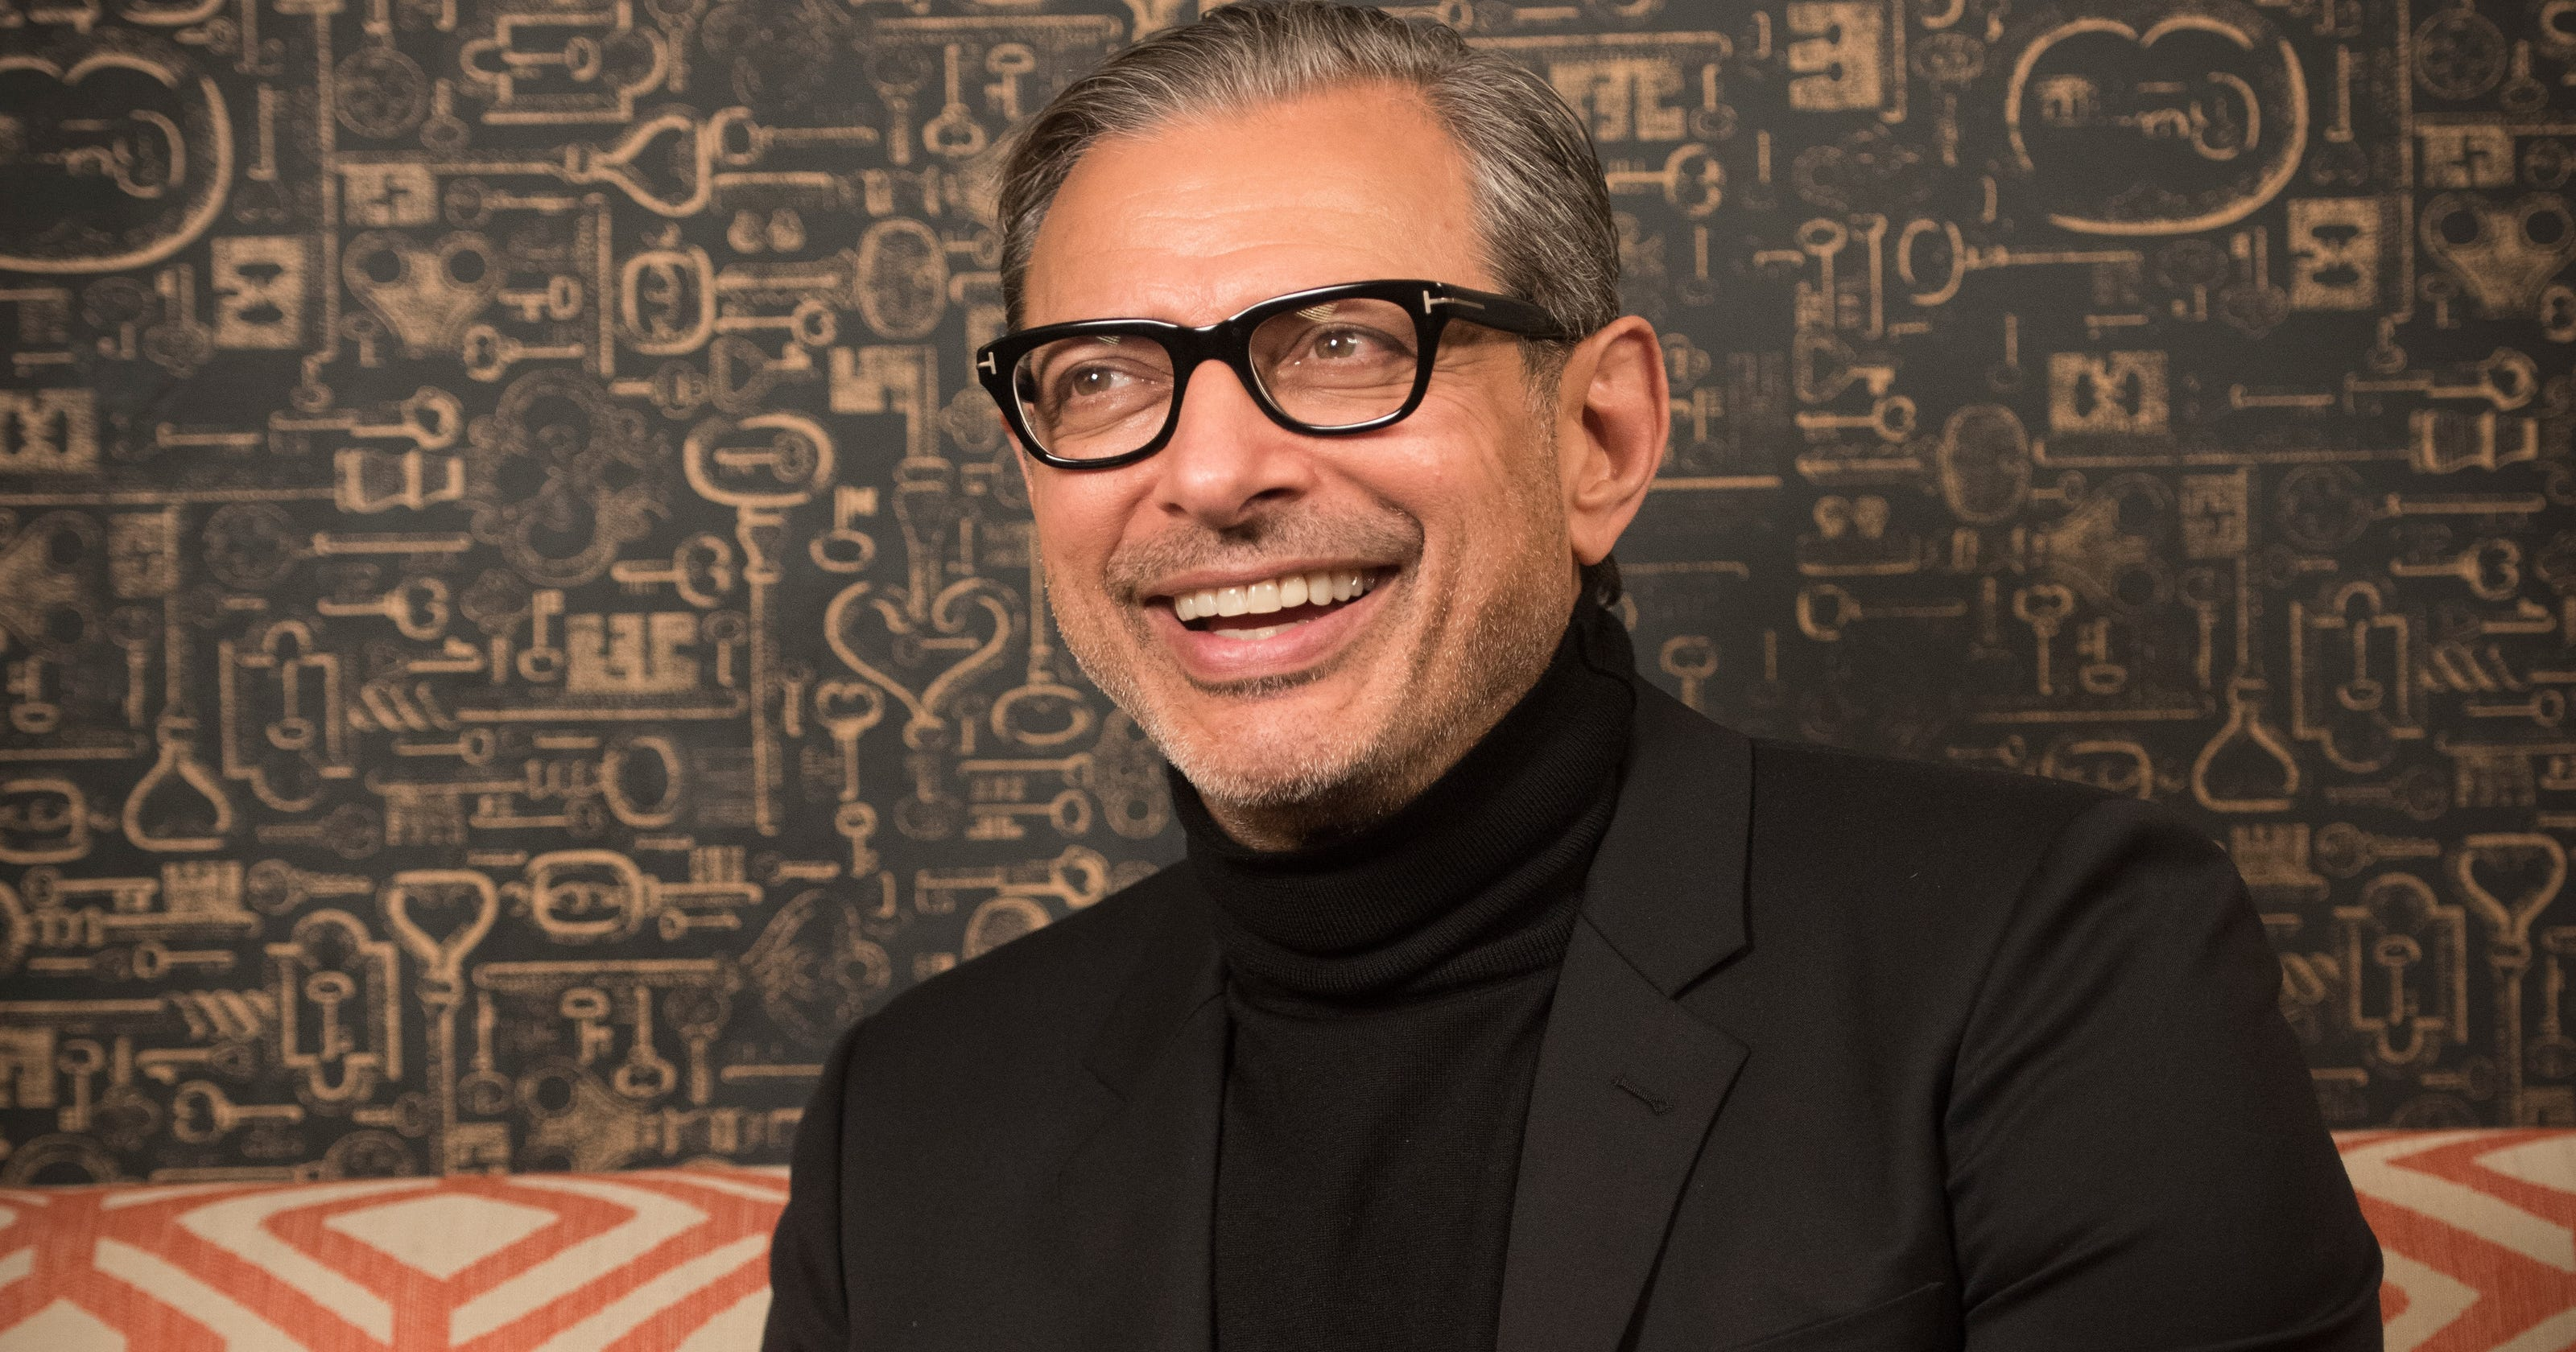 Jeff Goldblum Independence Day Resurgence